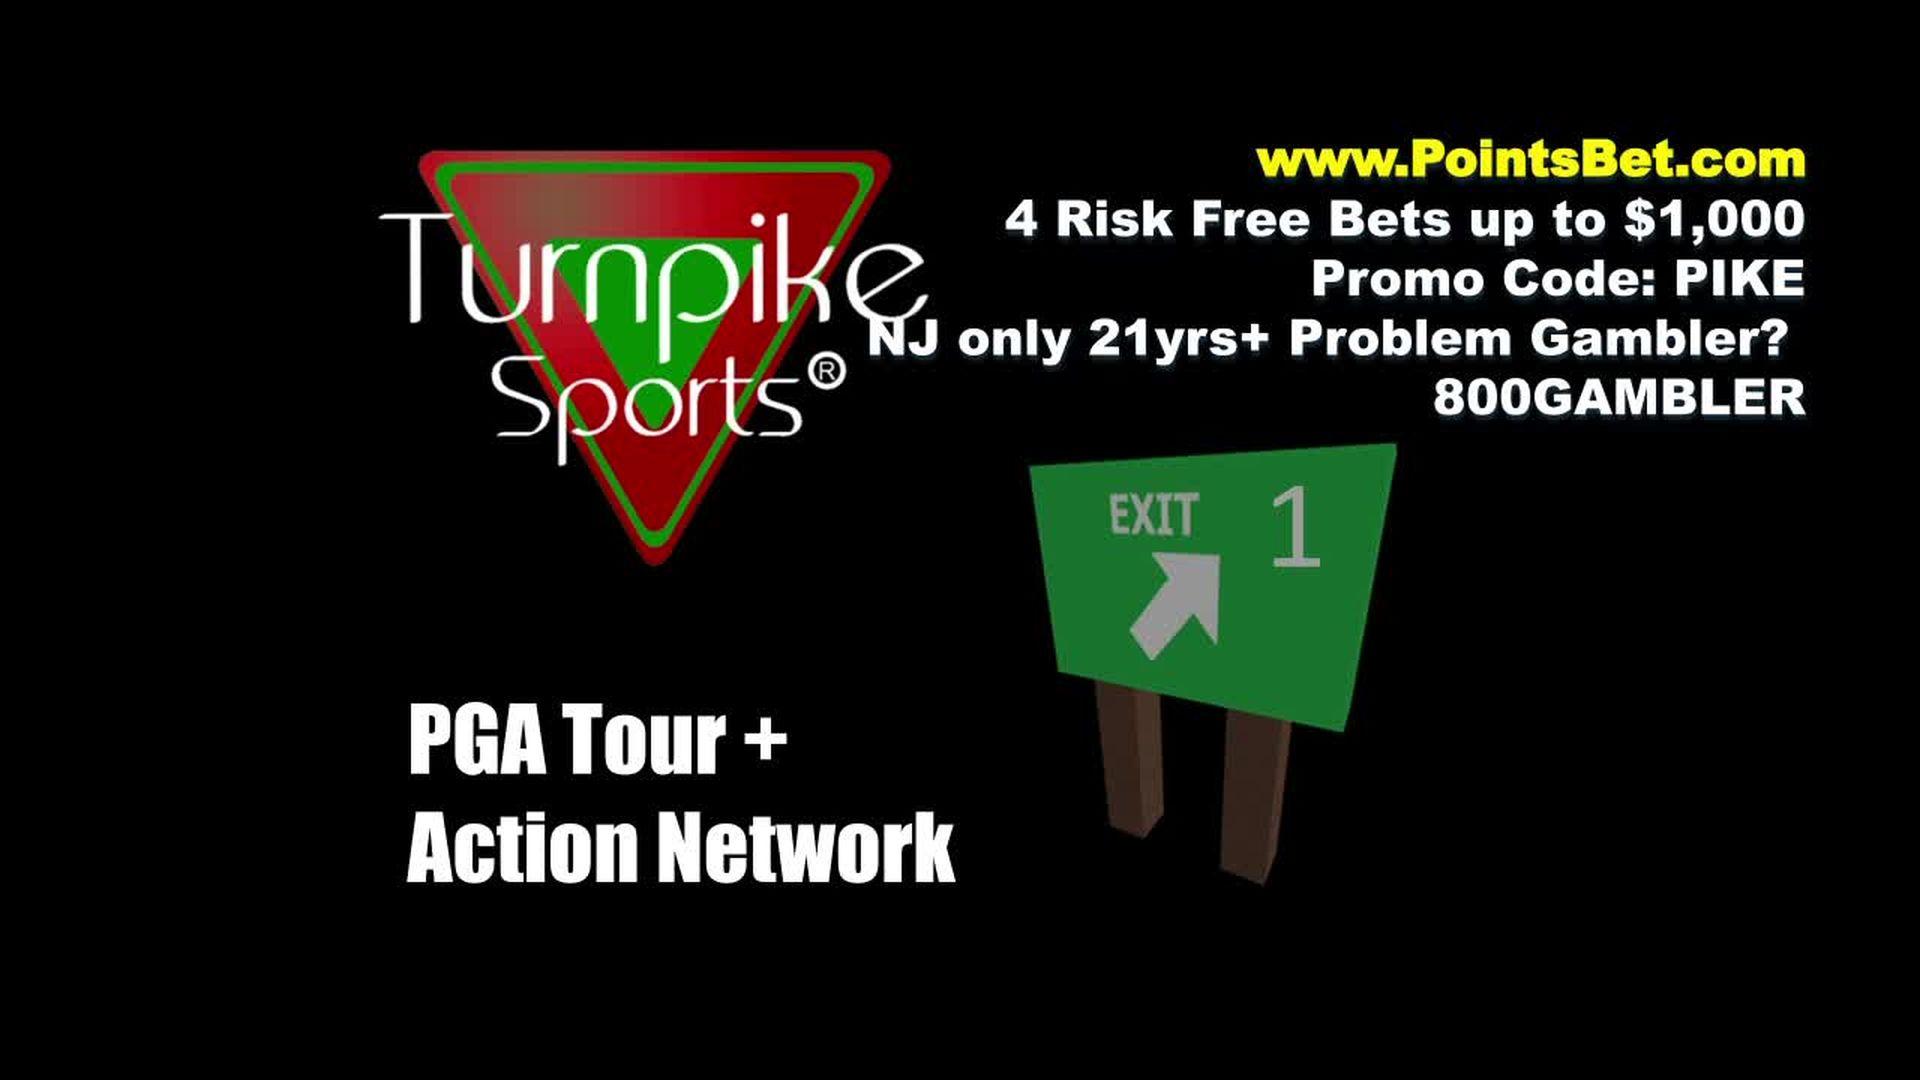 Turnpike Sports® - S 4 - Ep 9